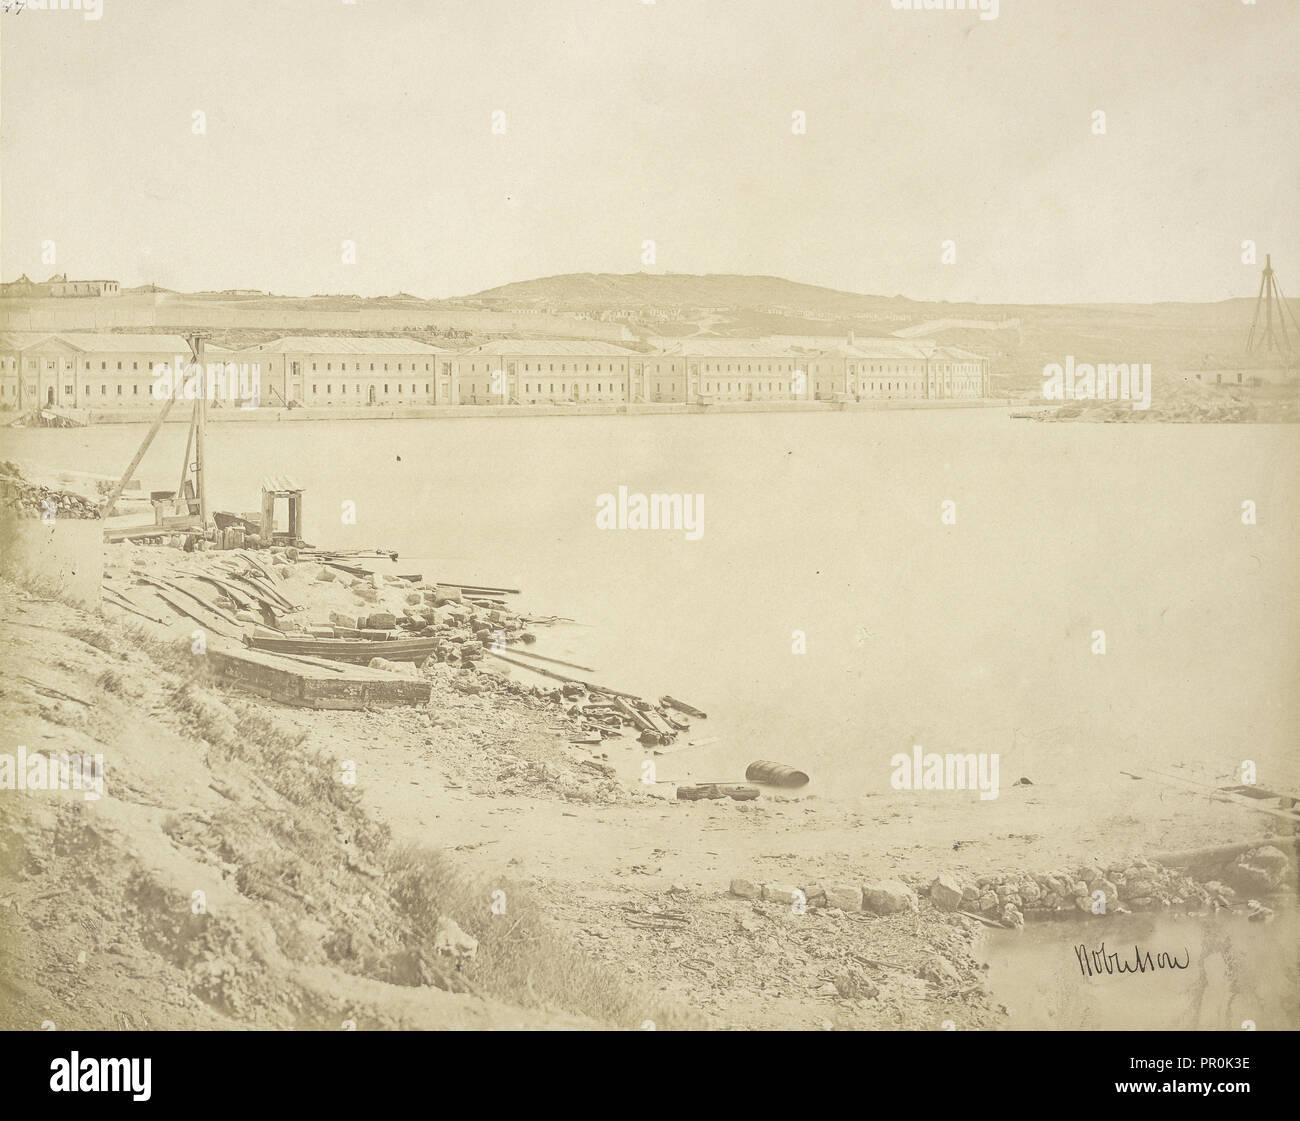 Panorama of Sebastopol From the Malakoff Tower; James Robertson, English, 1813 - 1888, Attributed to Felice Beato English - Stock Image